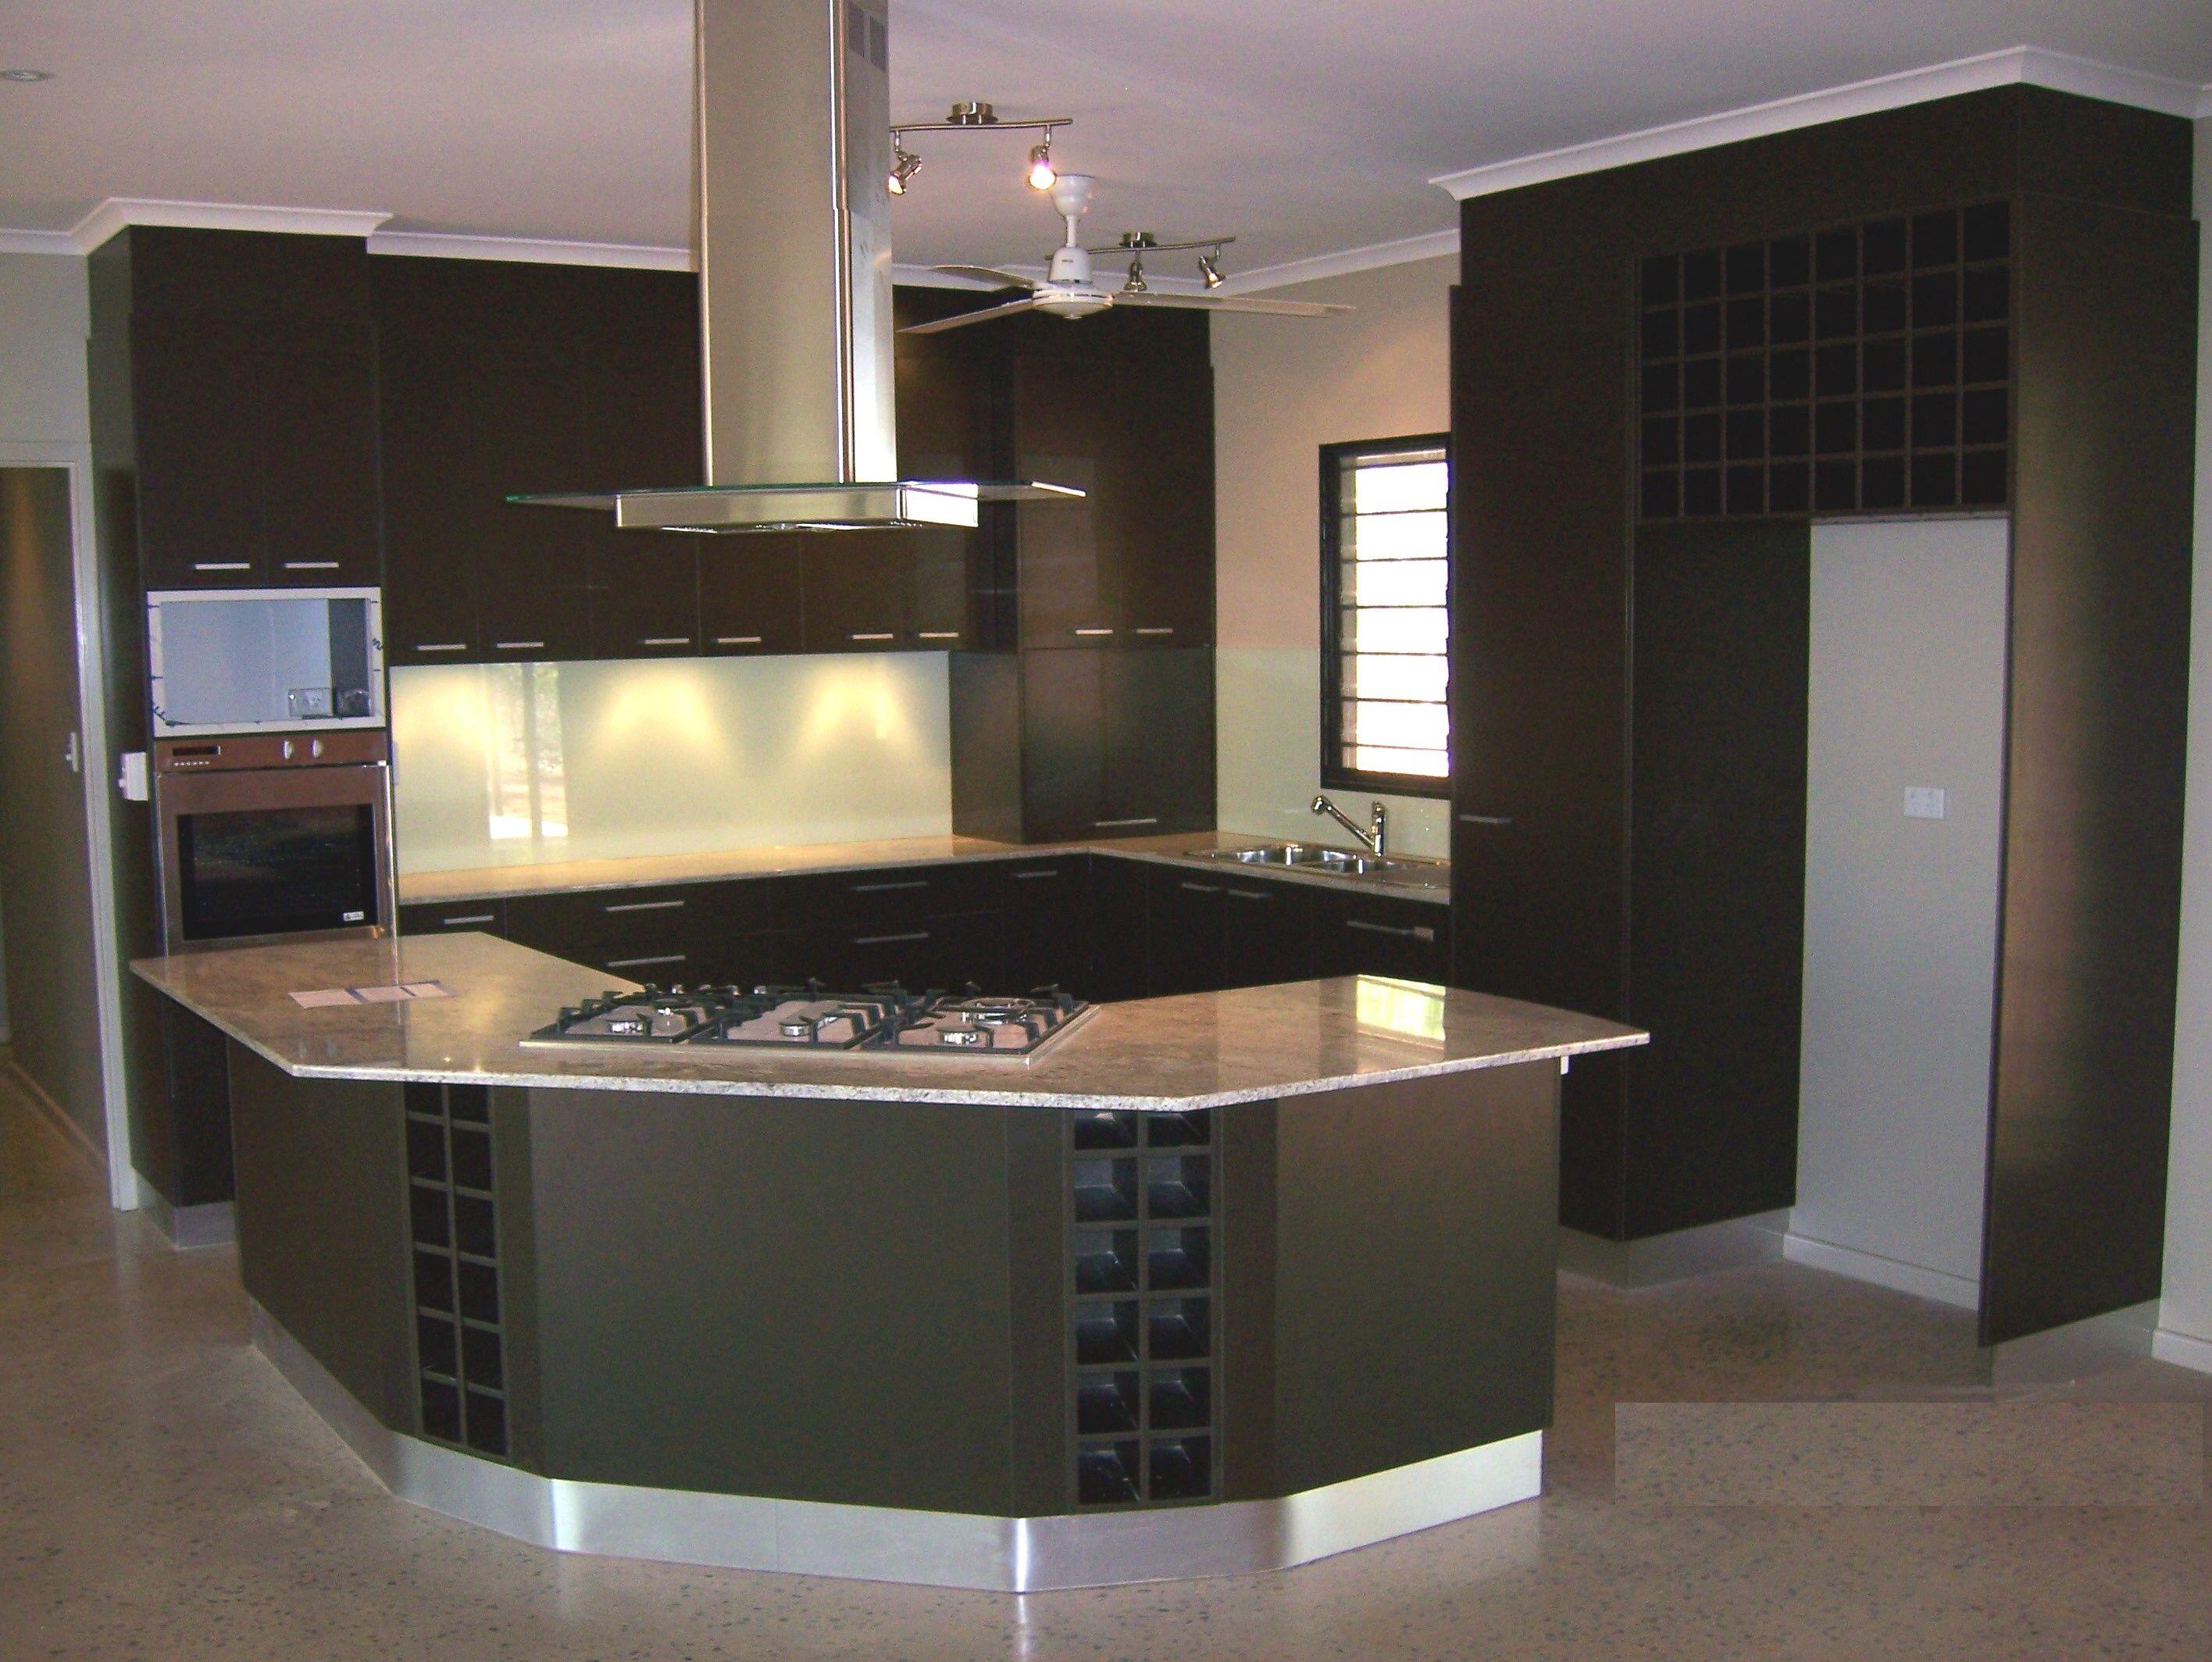 Kitchen Beautiful Trends Kitchen Islands Designs Ideas On All Of Interesting Latest Kitchen Design 2018